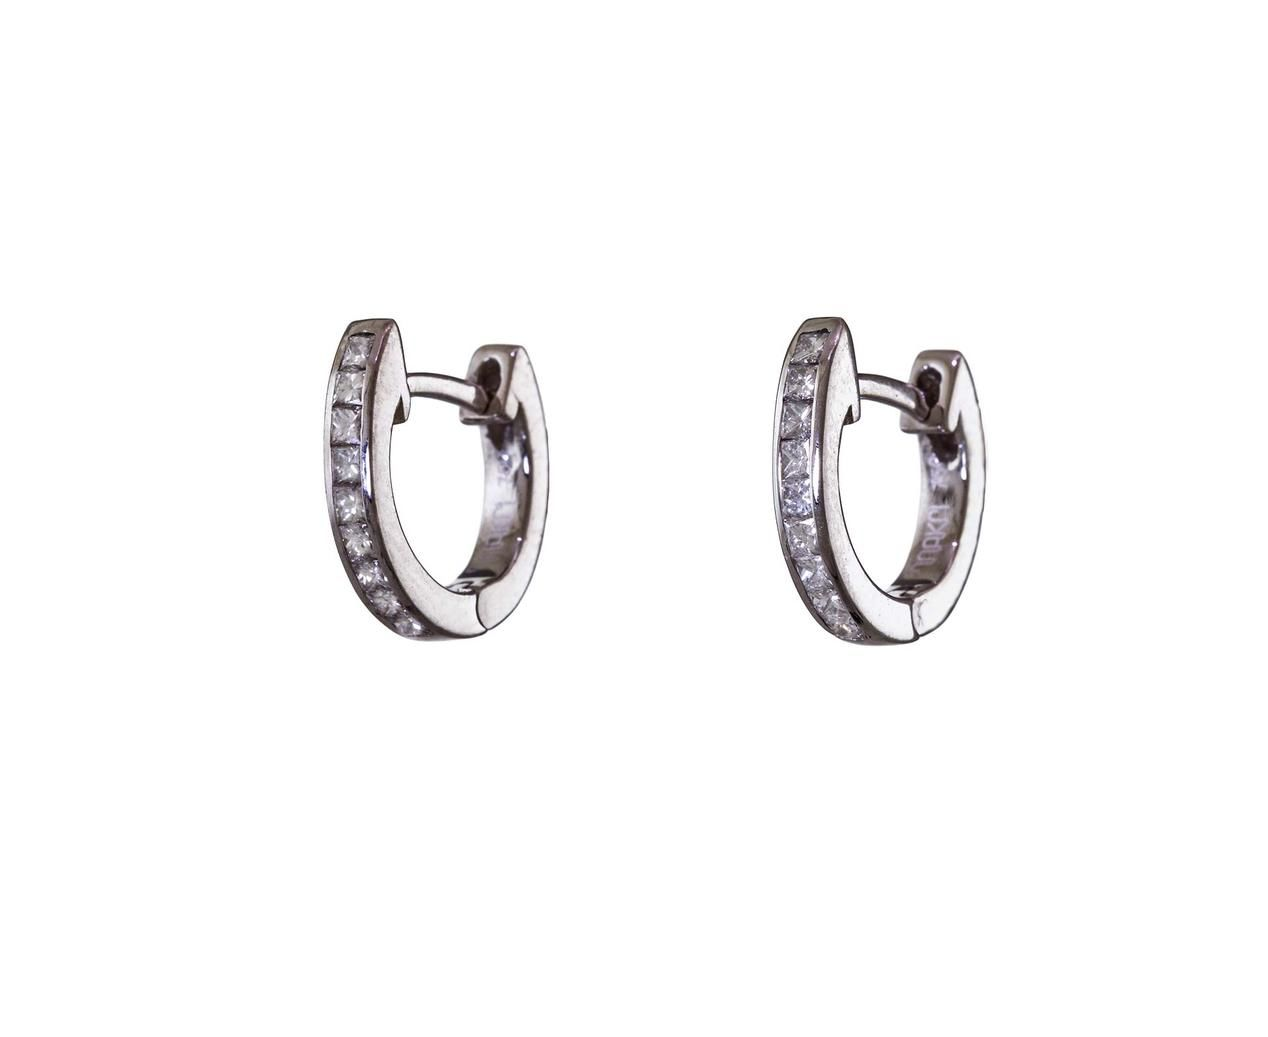 Riddles Jewelry | Chd Jewelry | Ileana Makri